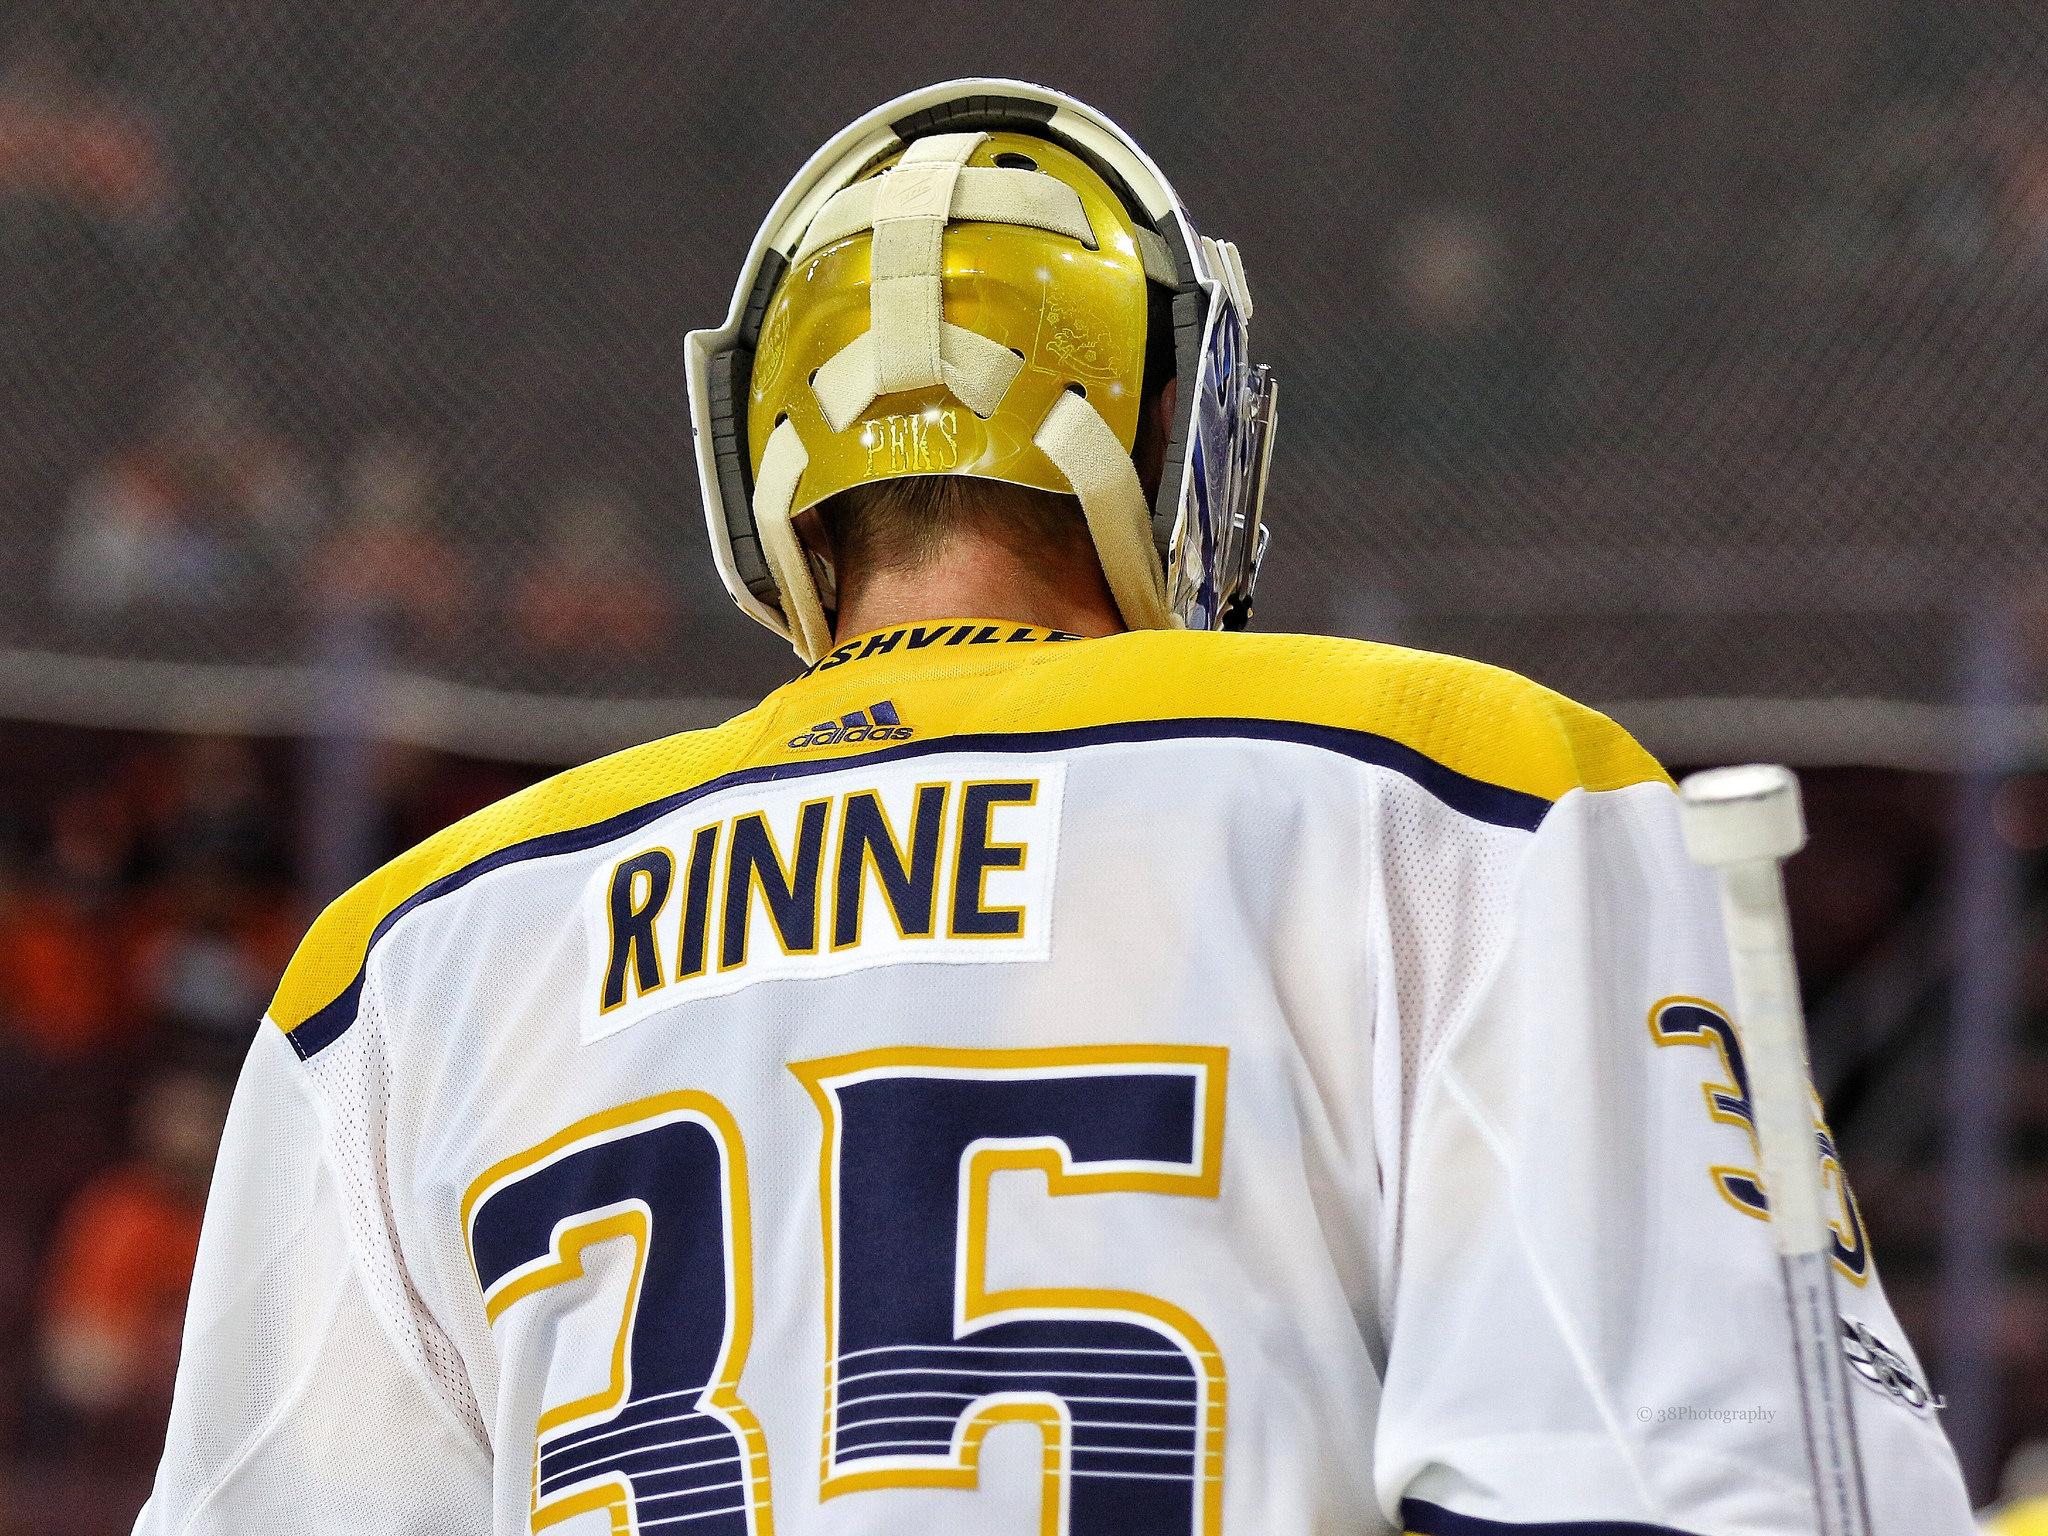 separation shoes cfa3b c3fd0 Nashville Predators: Pekka Rinne Should Be Traded